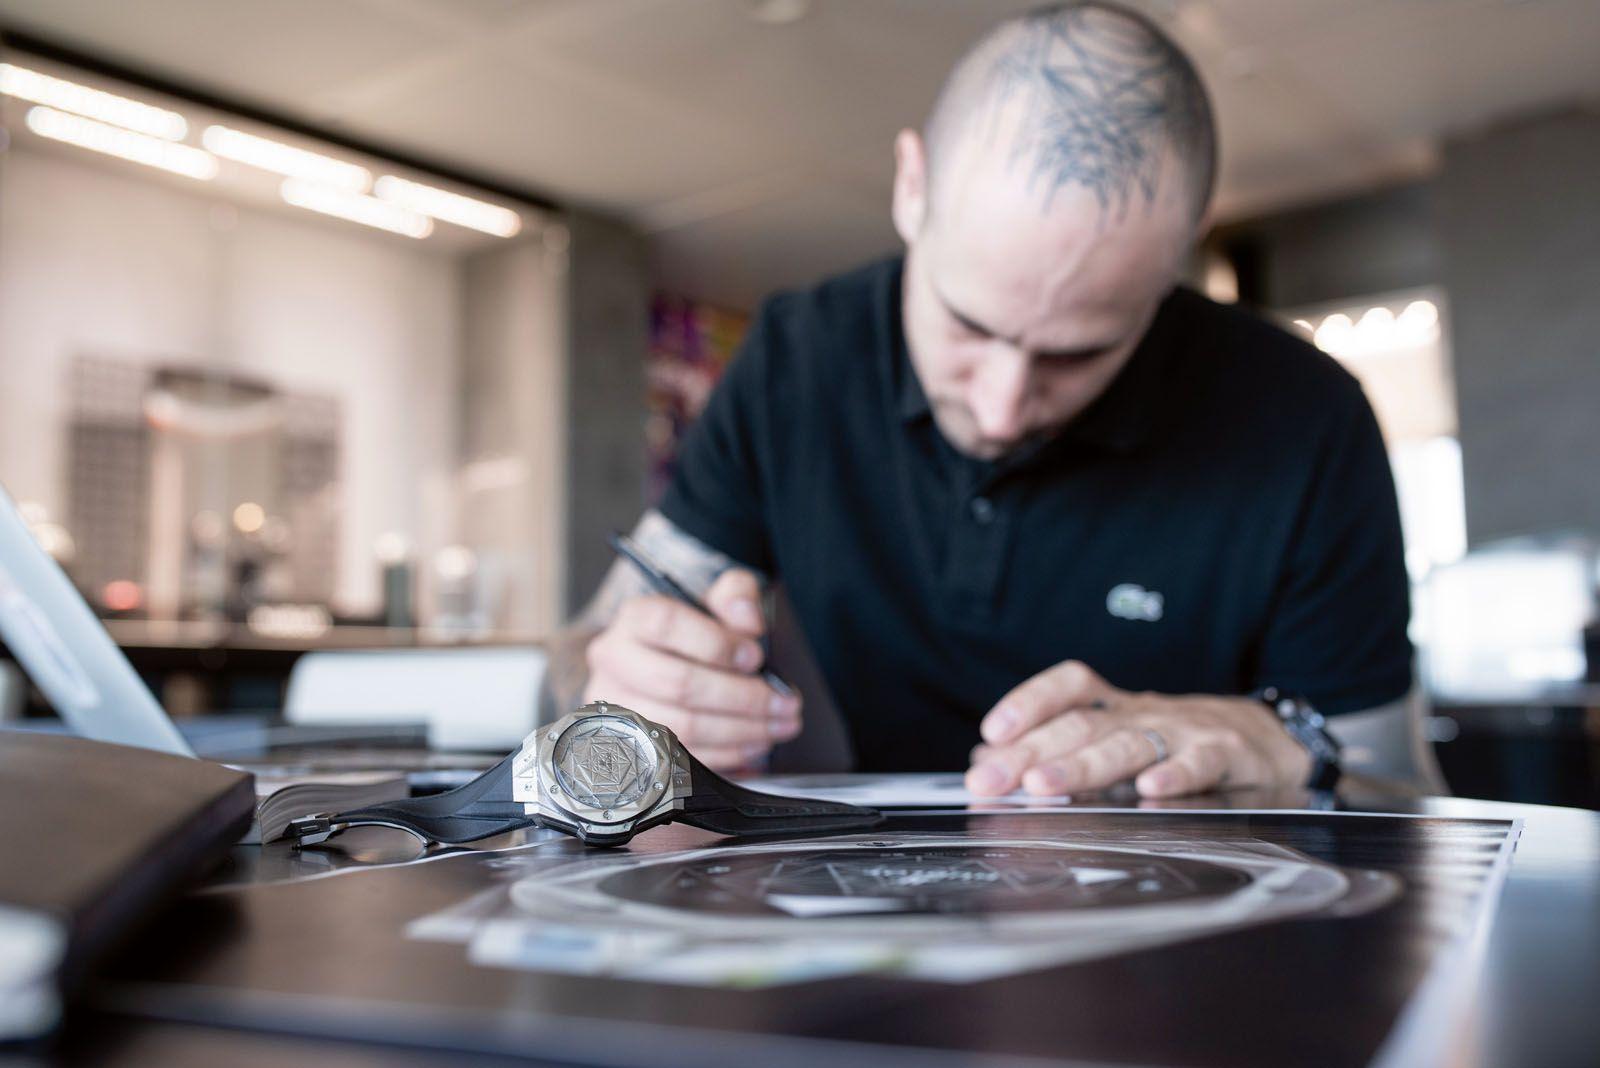 Swiss tattoo artist Maxime Plescia-Buchi is the creative mind behind the Hublot Big Bang Sang Bleu series and the new Big Bang Unico Sang Bleu II watch